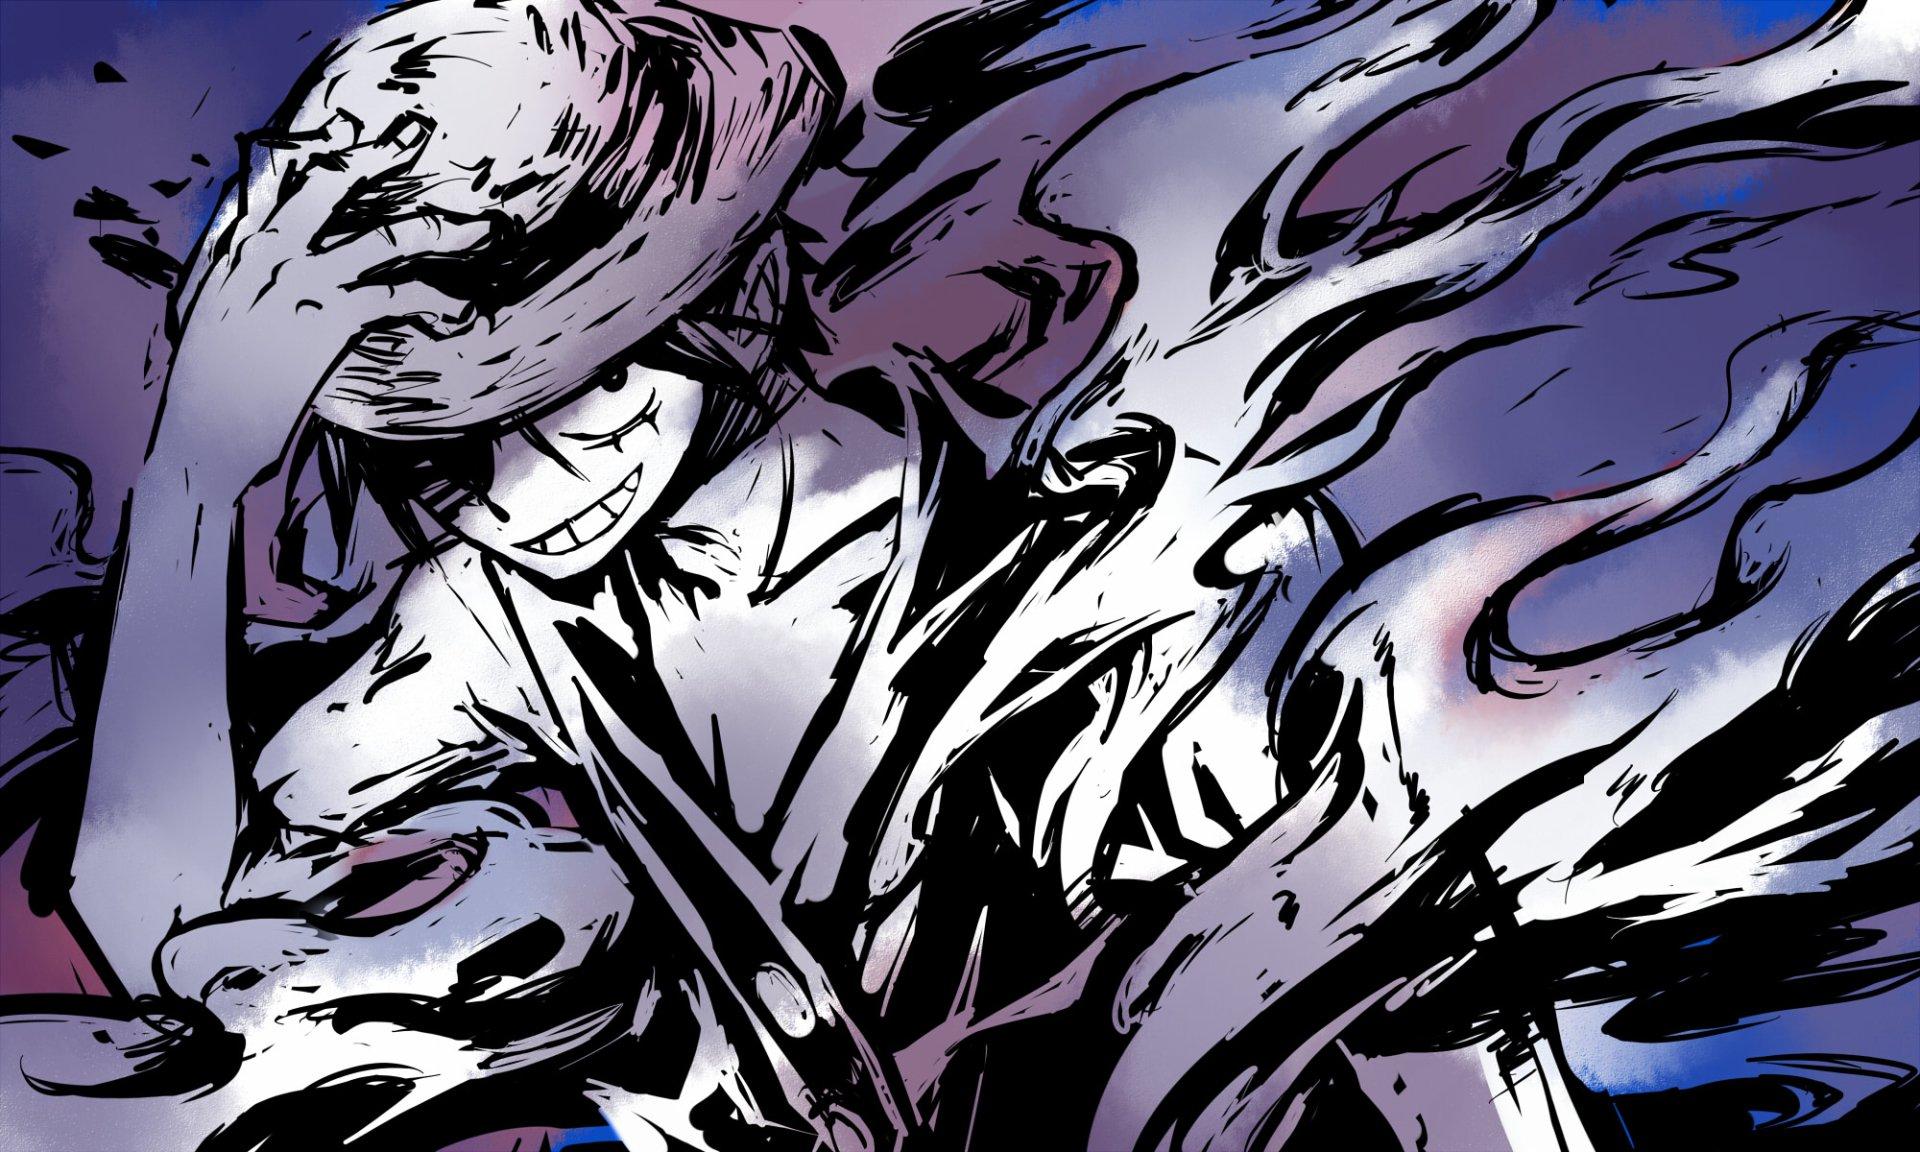 Unduh 4000+ Wallpaper Hd One Piece Zoro